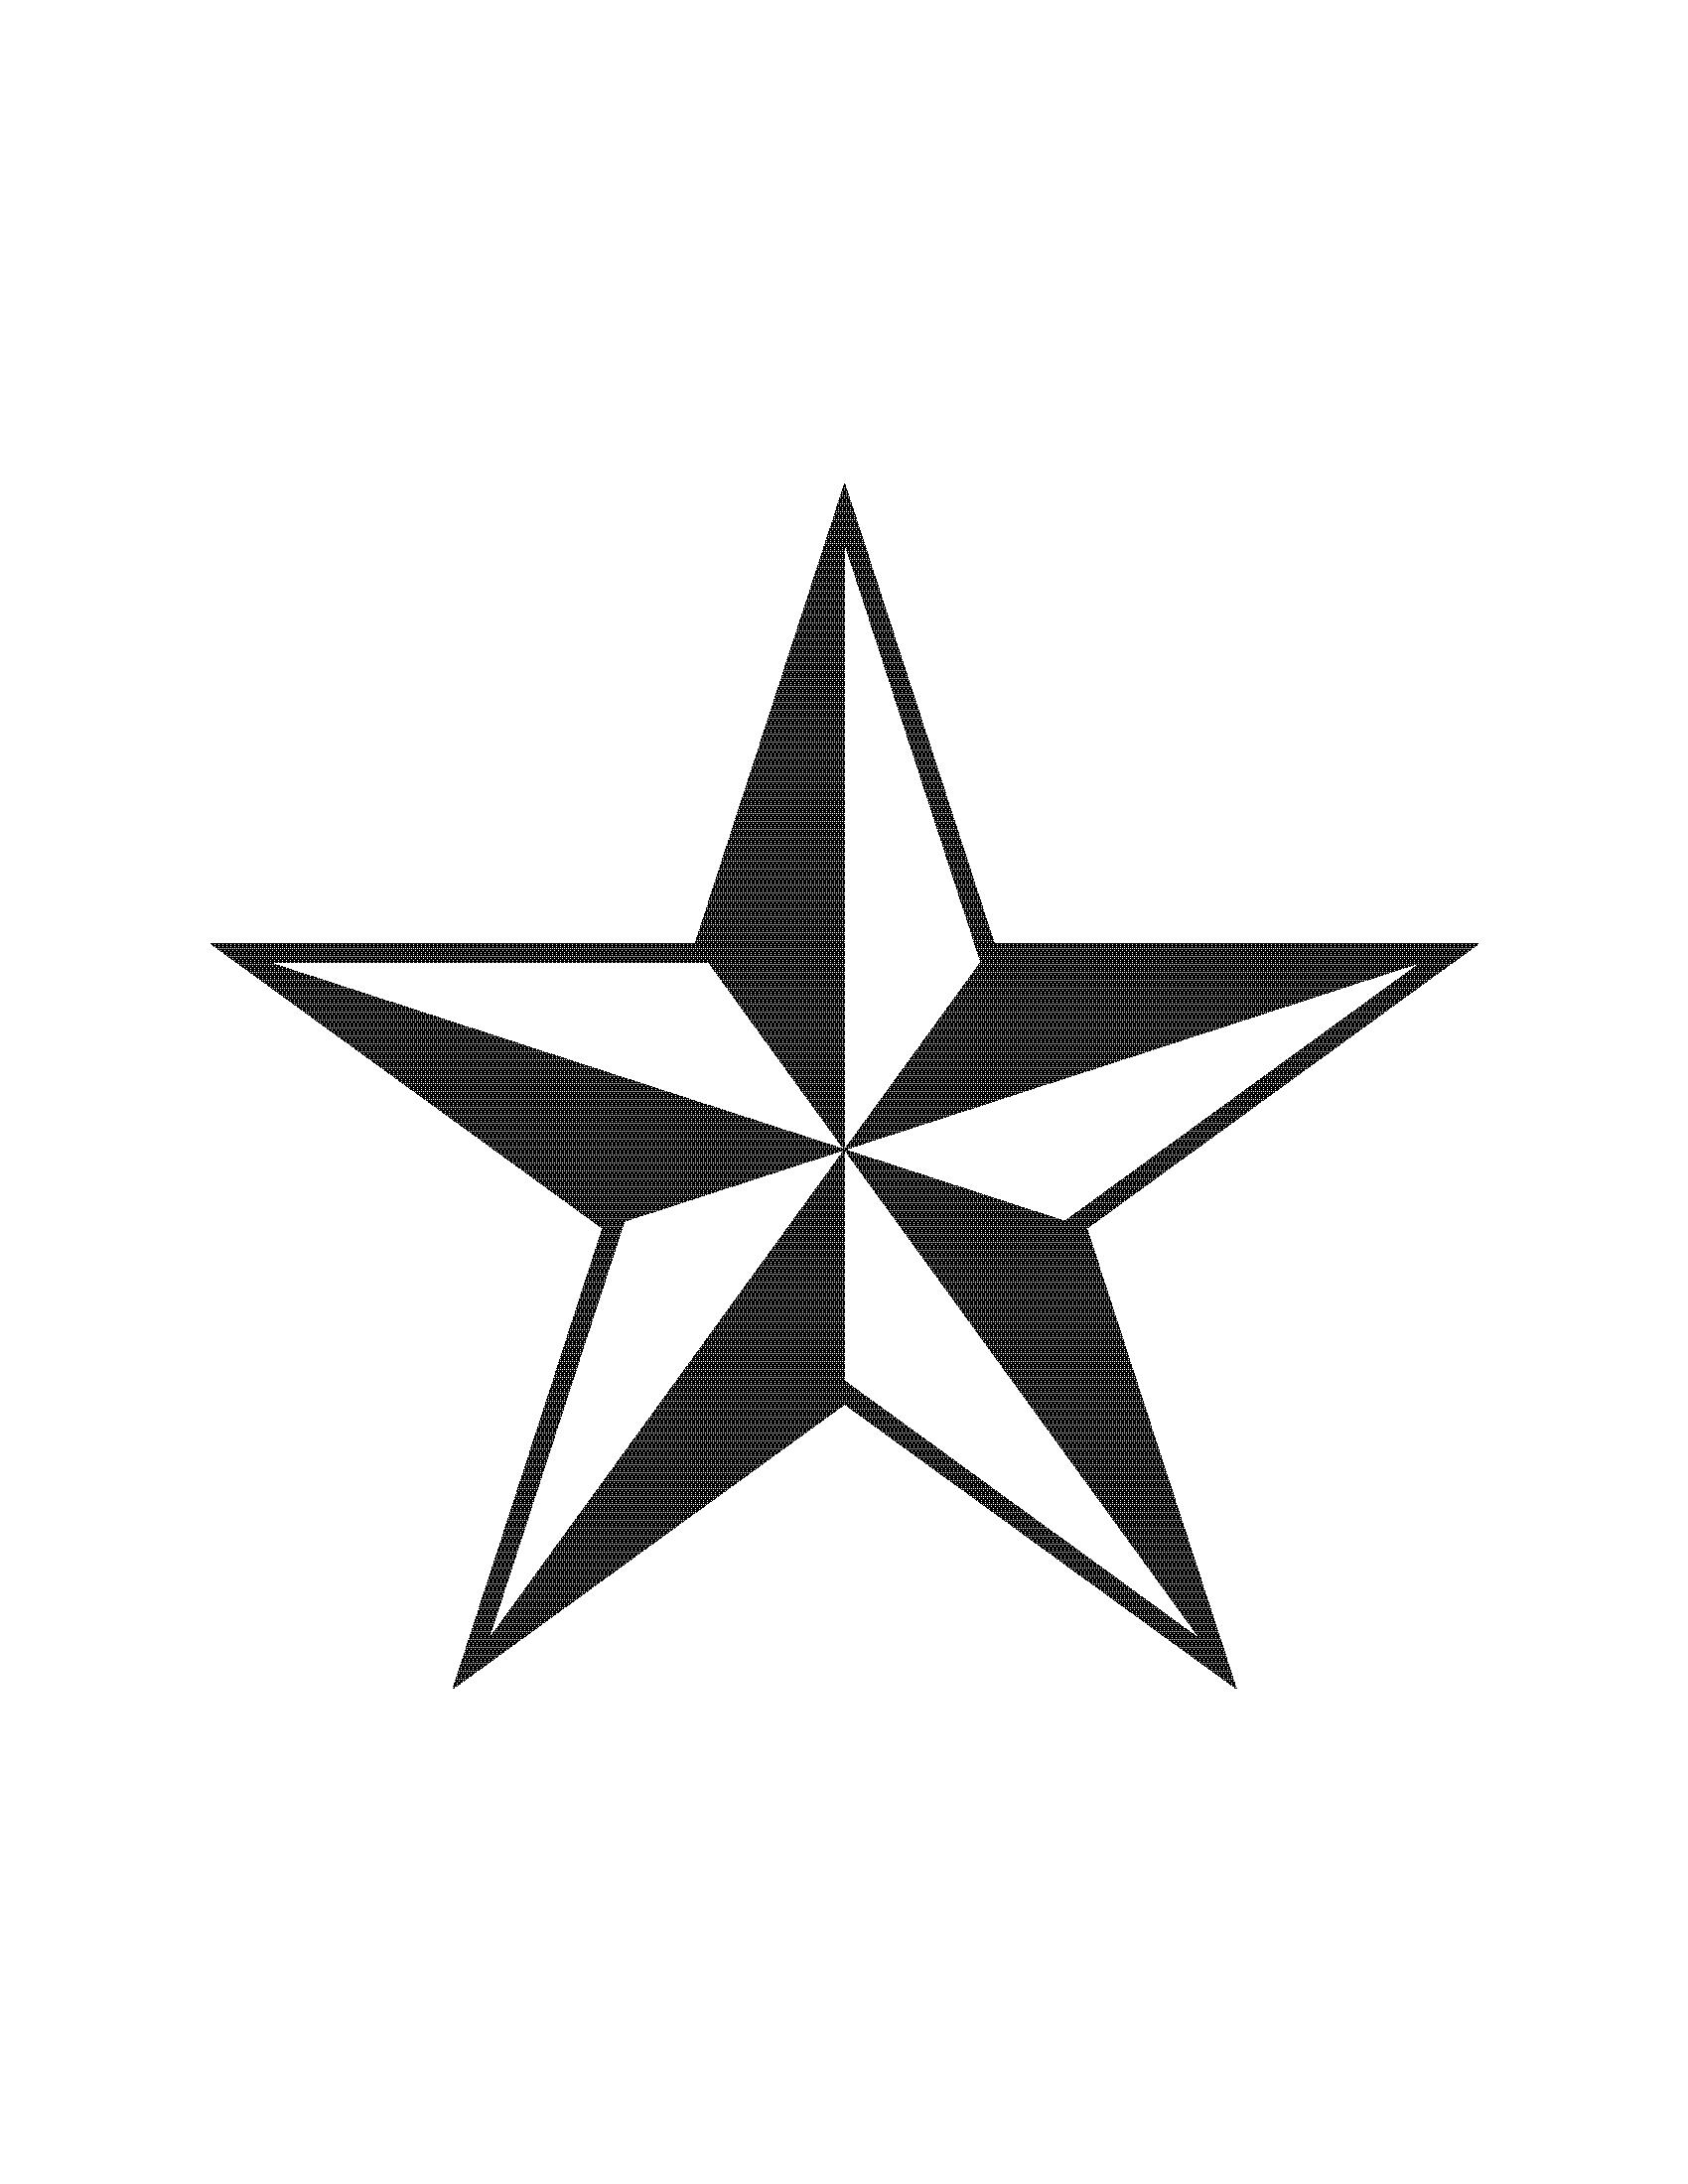 Punk clipart western star #15